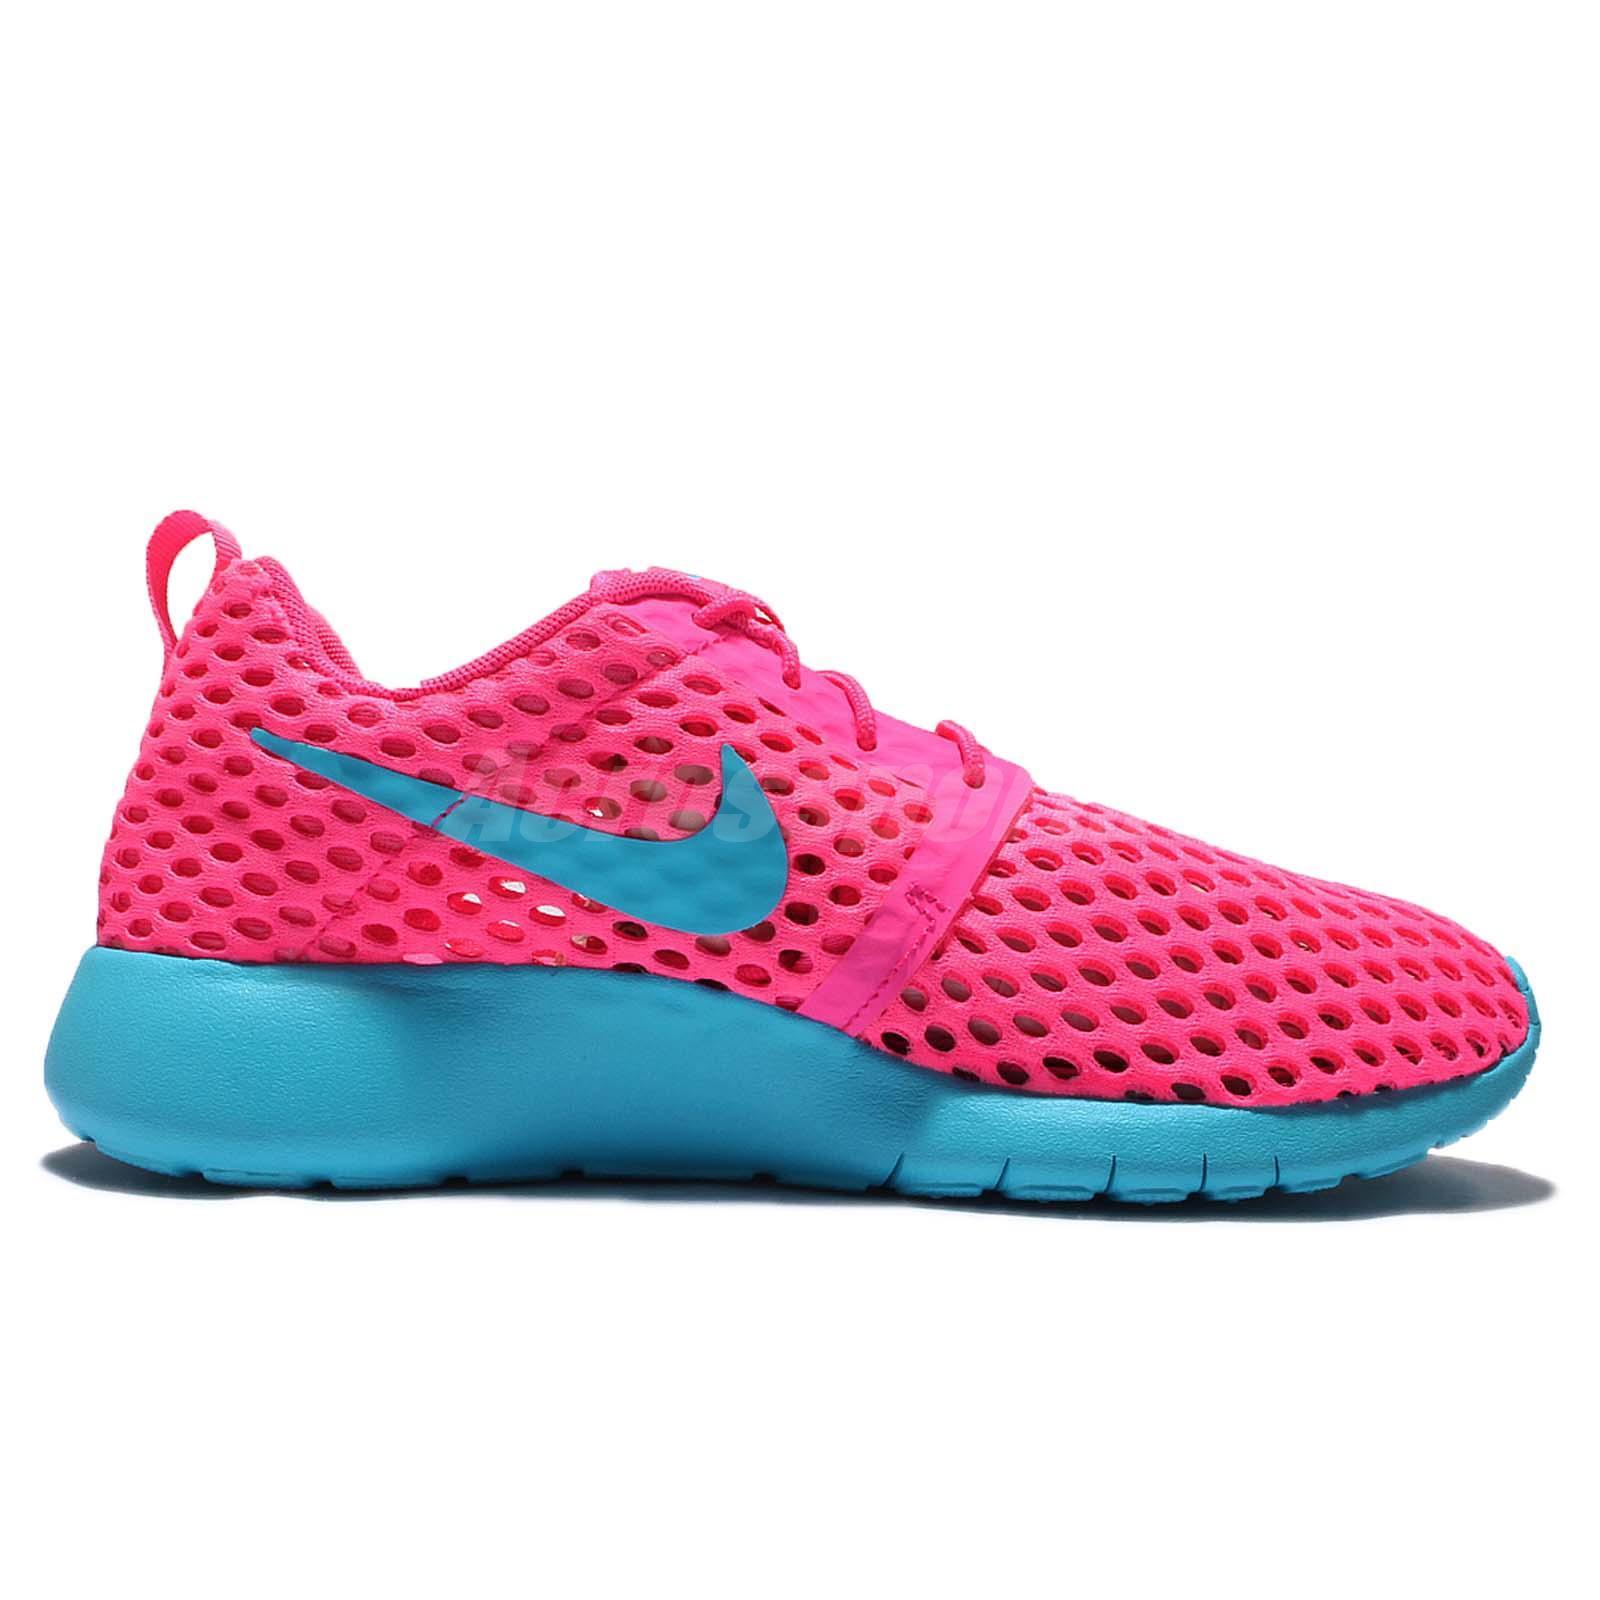 nike roshe pink and blue